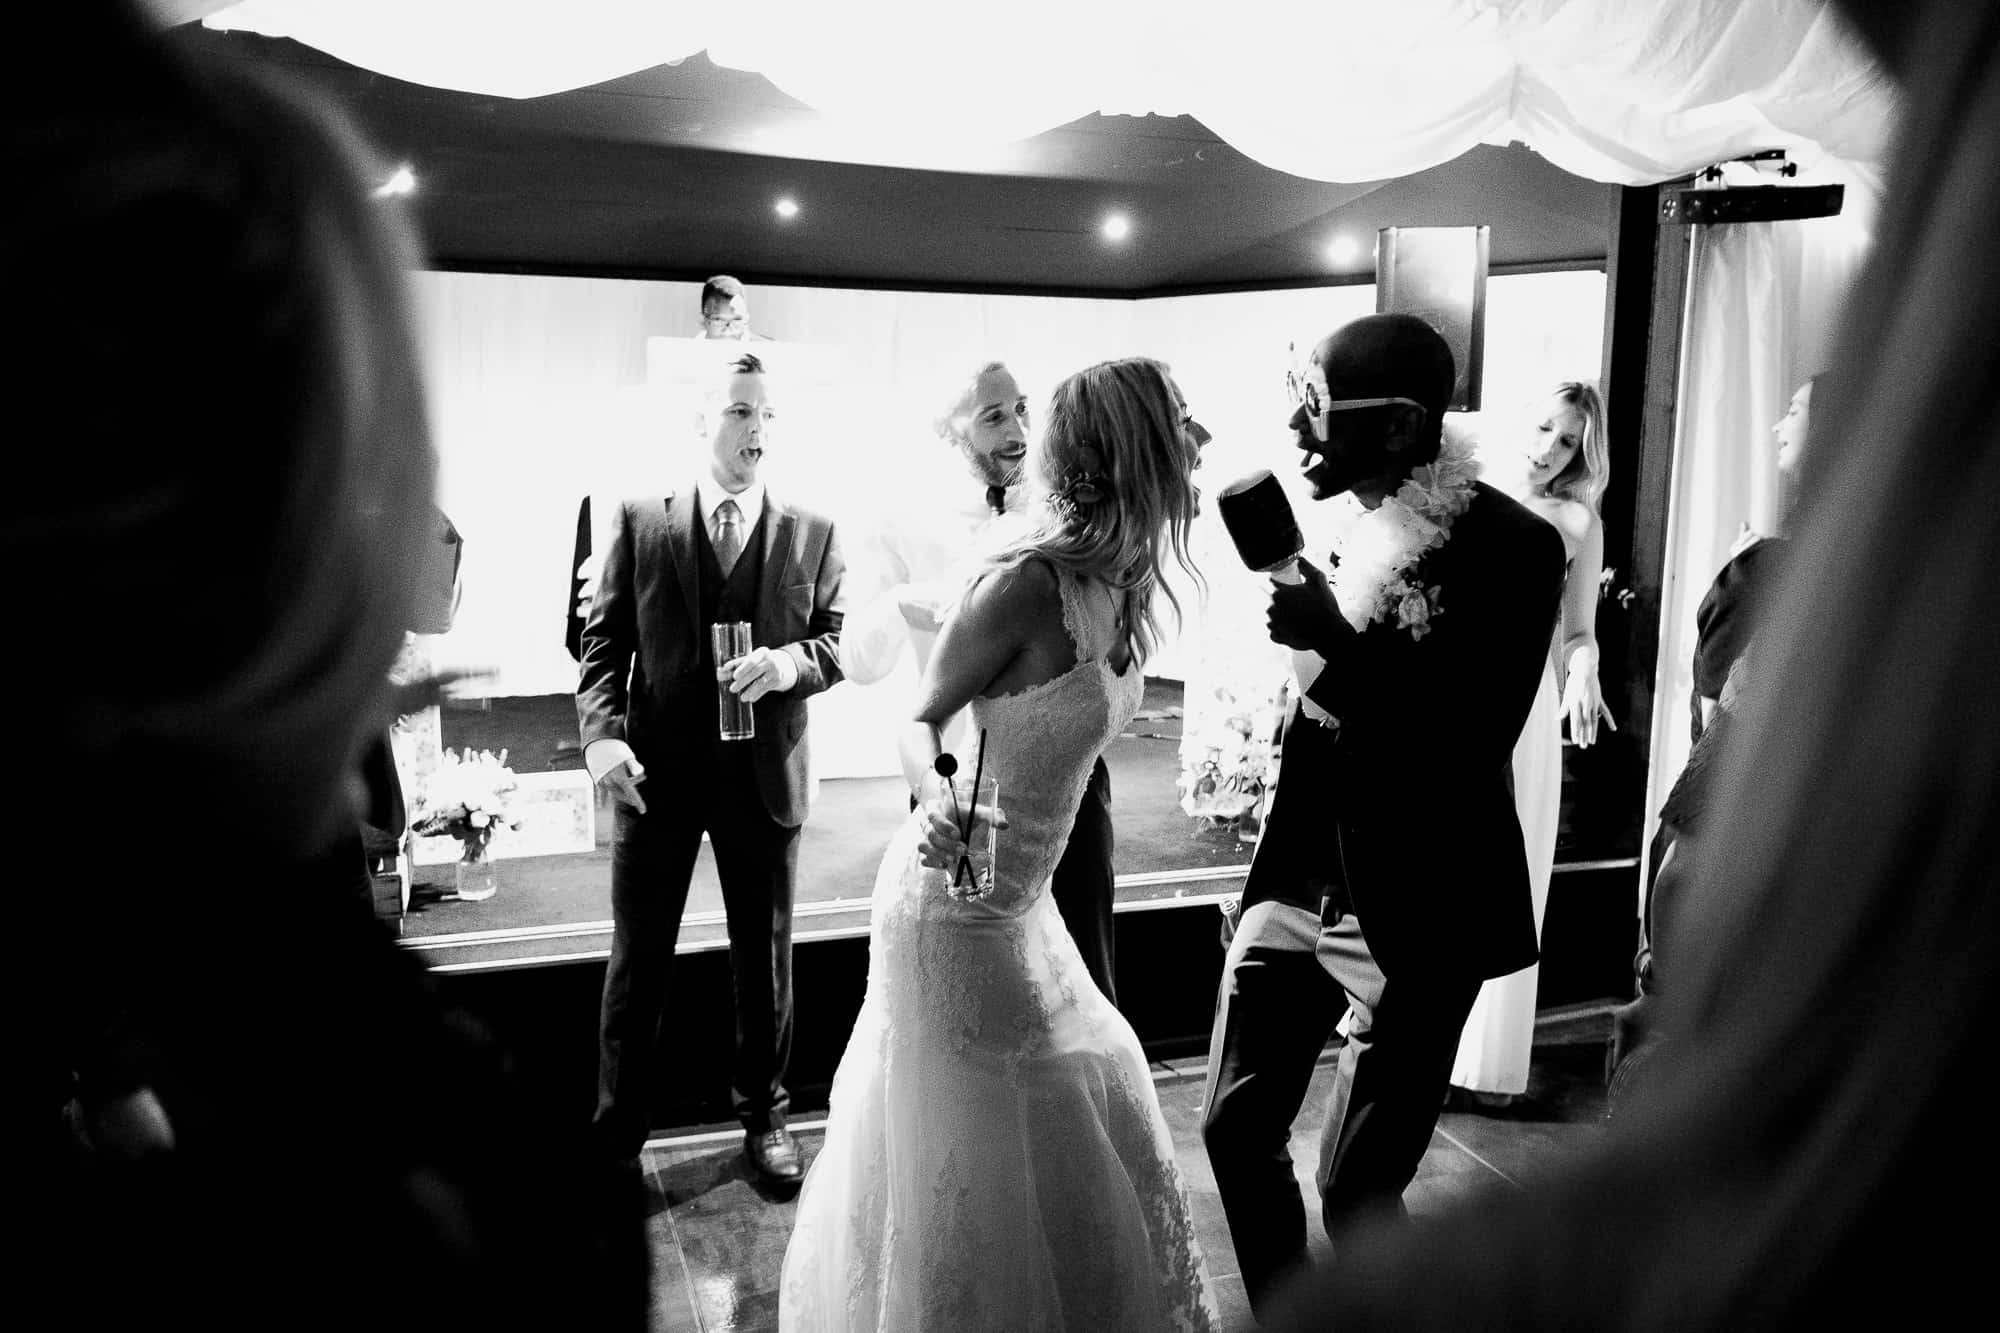 marleybrook-house-wedding-photography-matt-tyler-0070